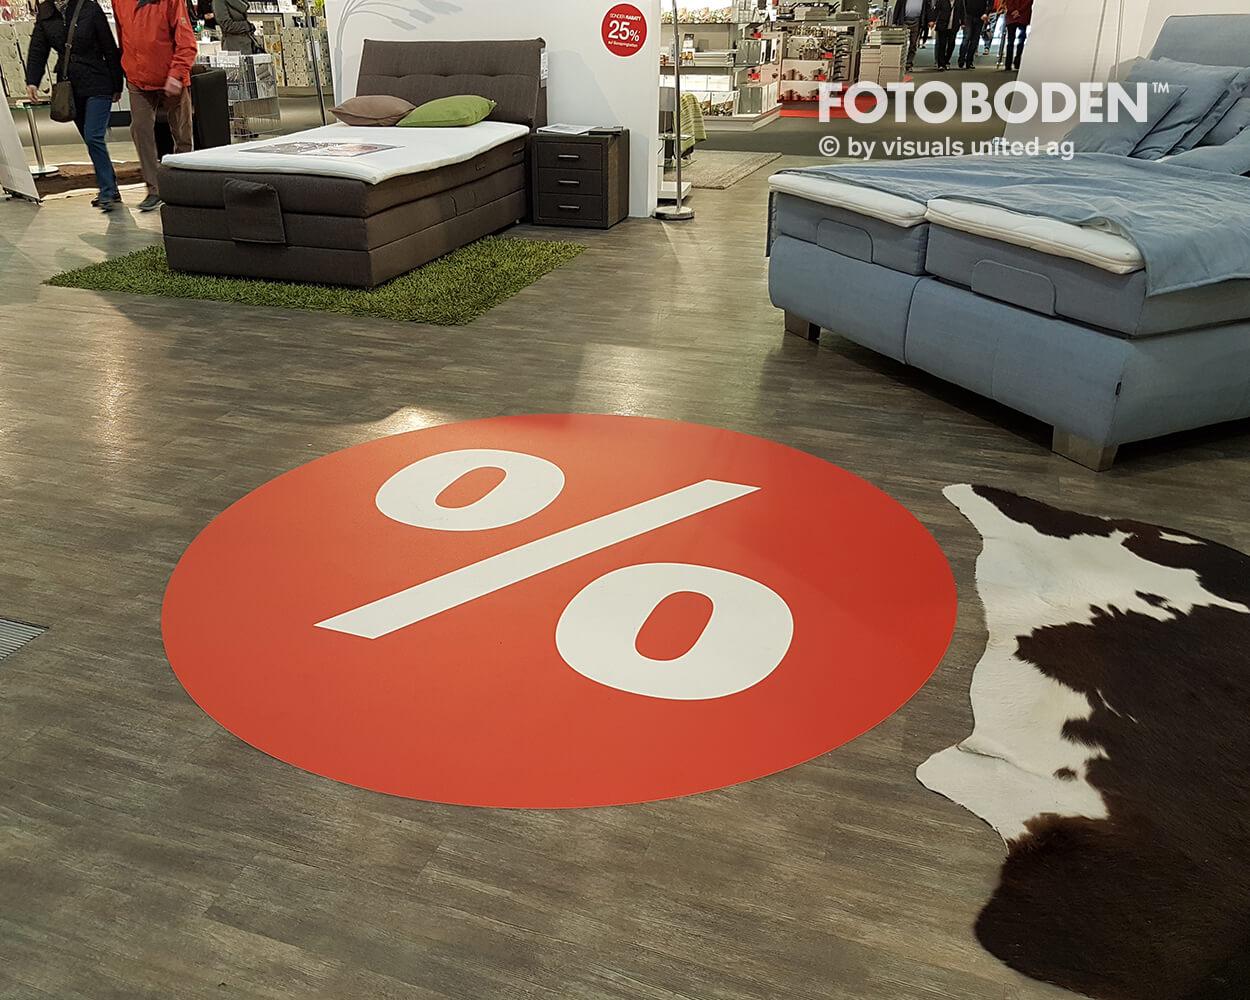 VMZB 2Fotoboden Flooring Fußboden Bodengestaltung Floorminder Bodendruck Werbung Fußbodenwerbung Bodenwerbung Merchandising Advertising